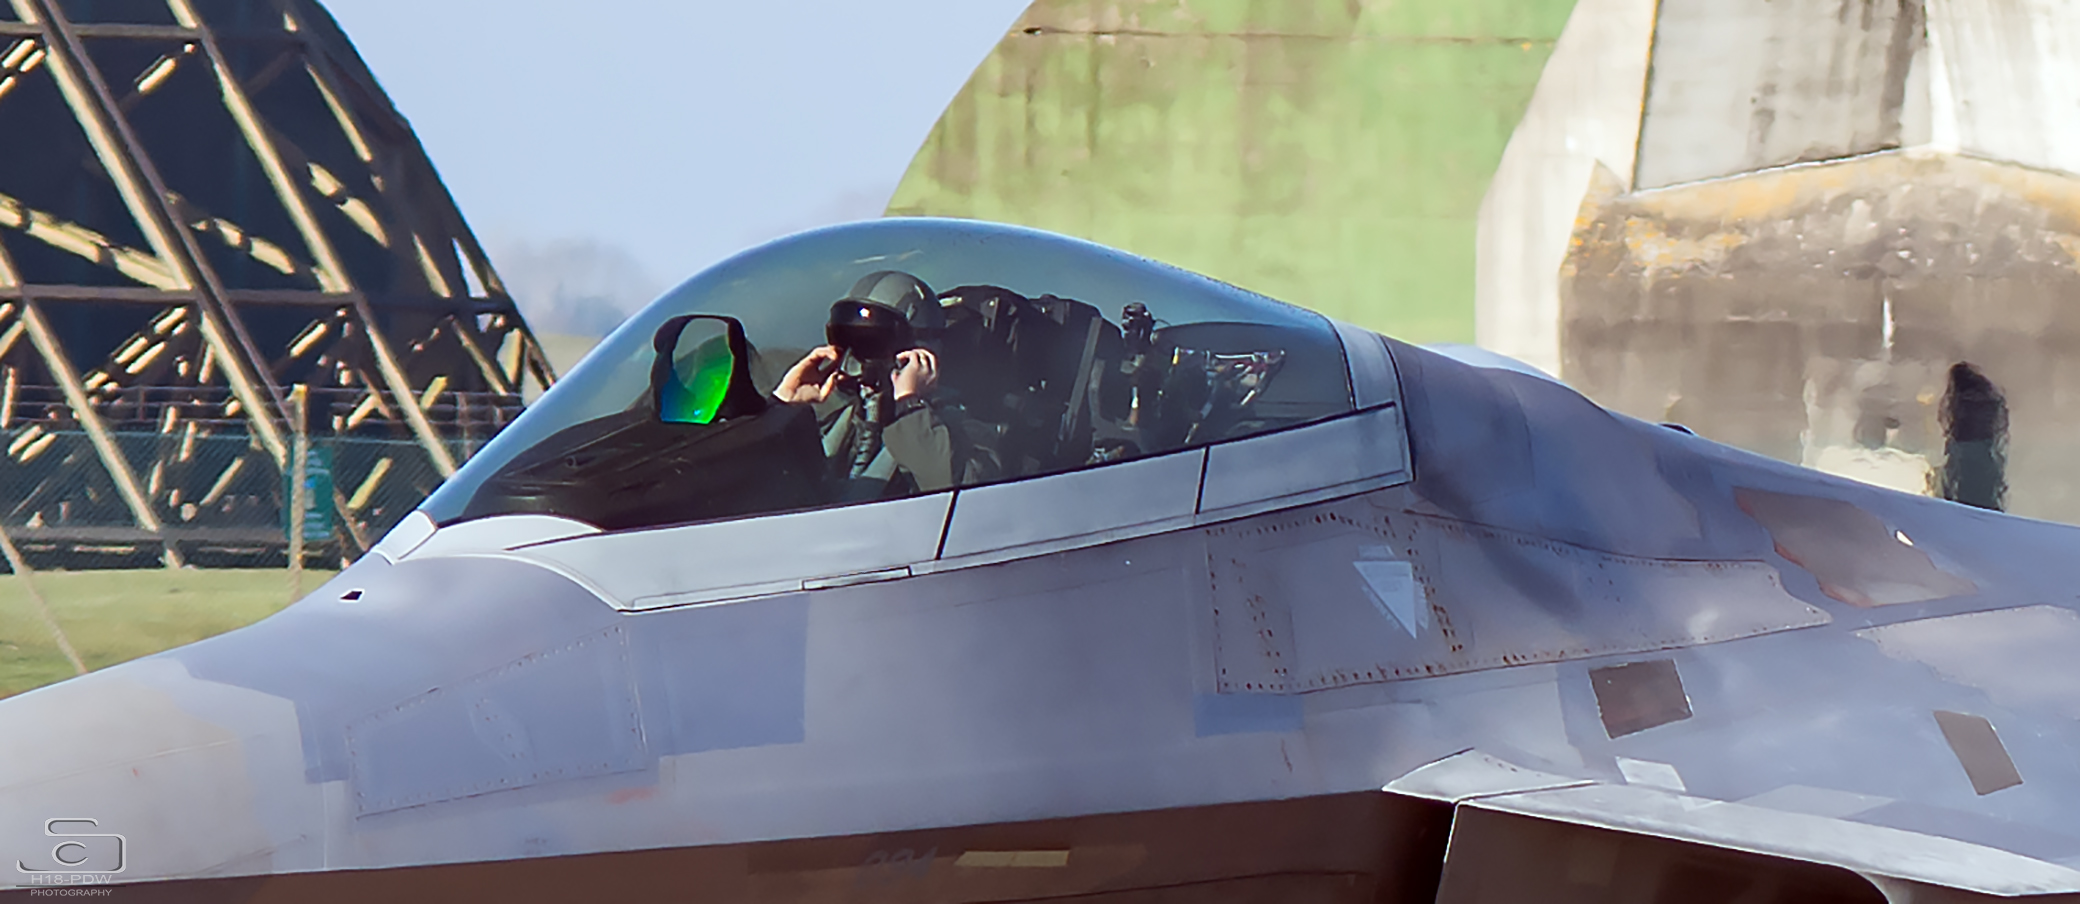 F22 Raptor Lakenheath cockpit shot